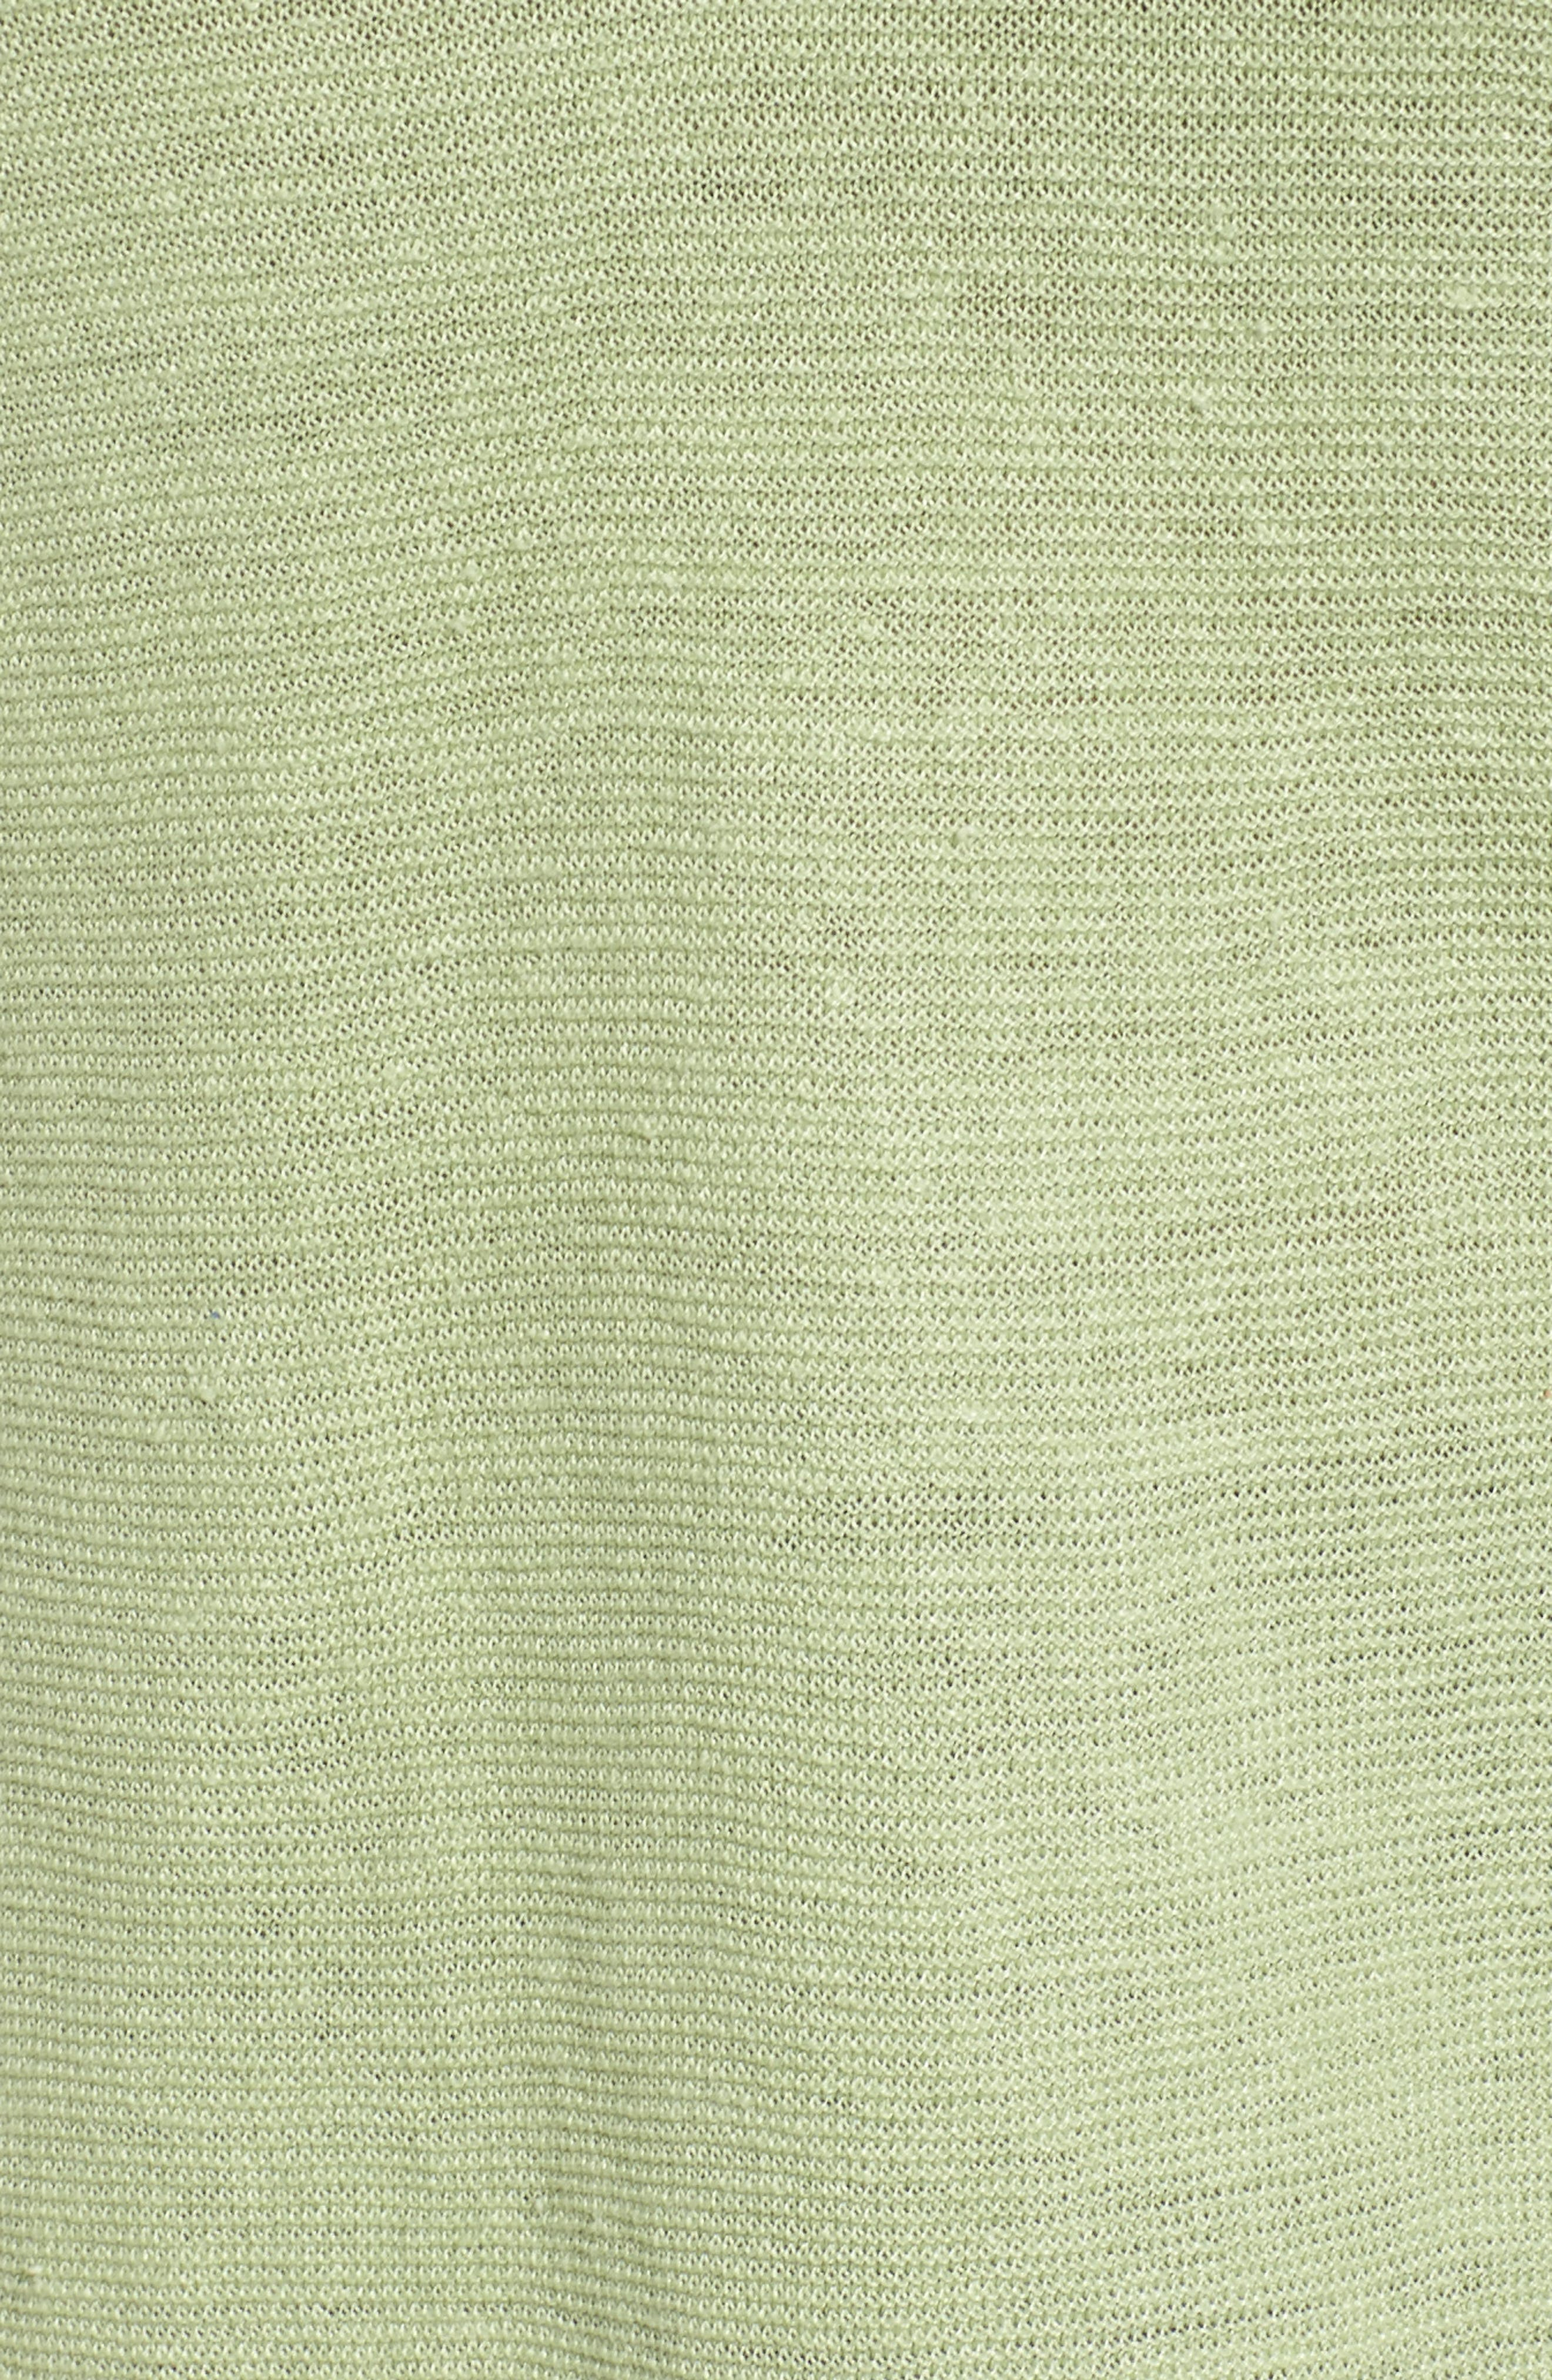 V-Neck Organic Linen Top,                             Alternate thumbnail 28, color,